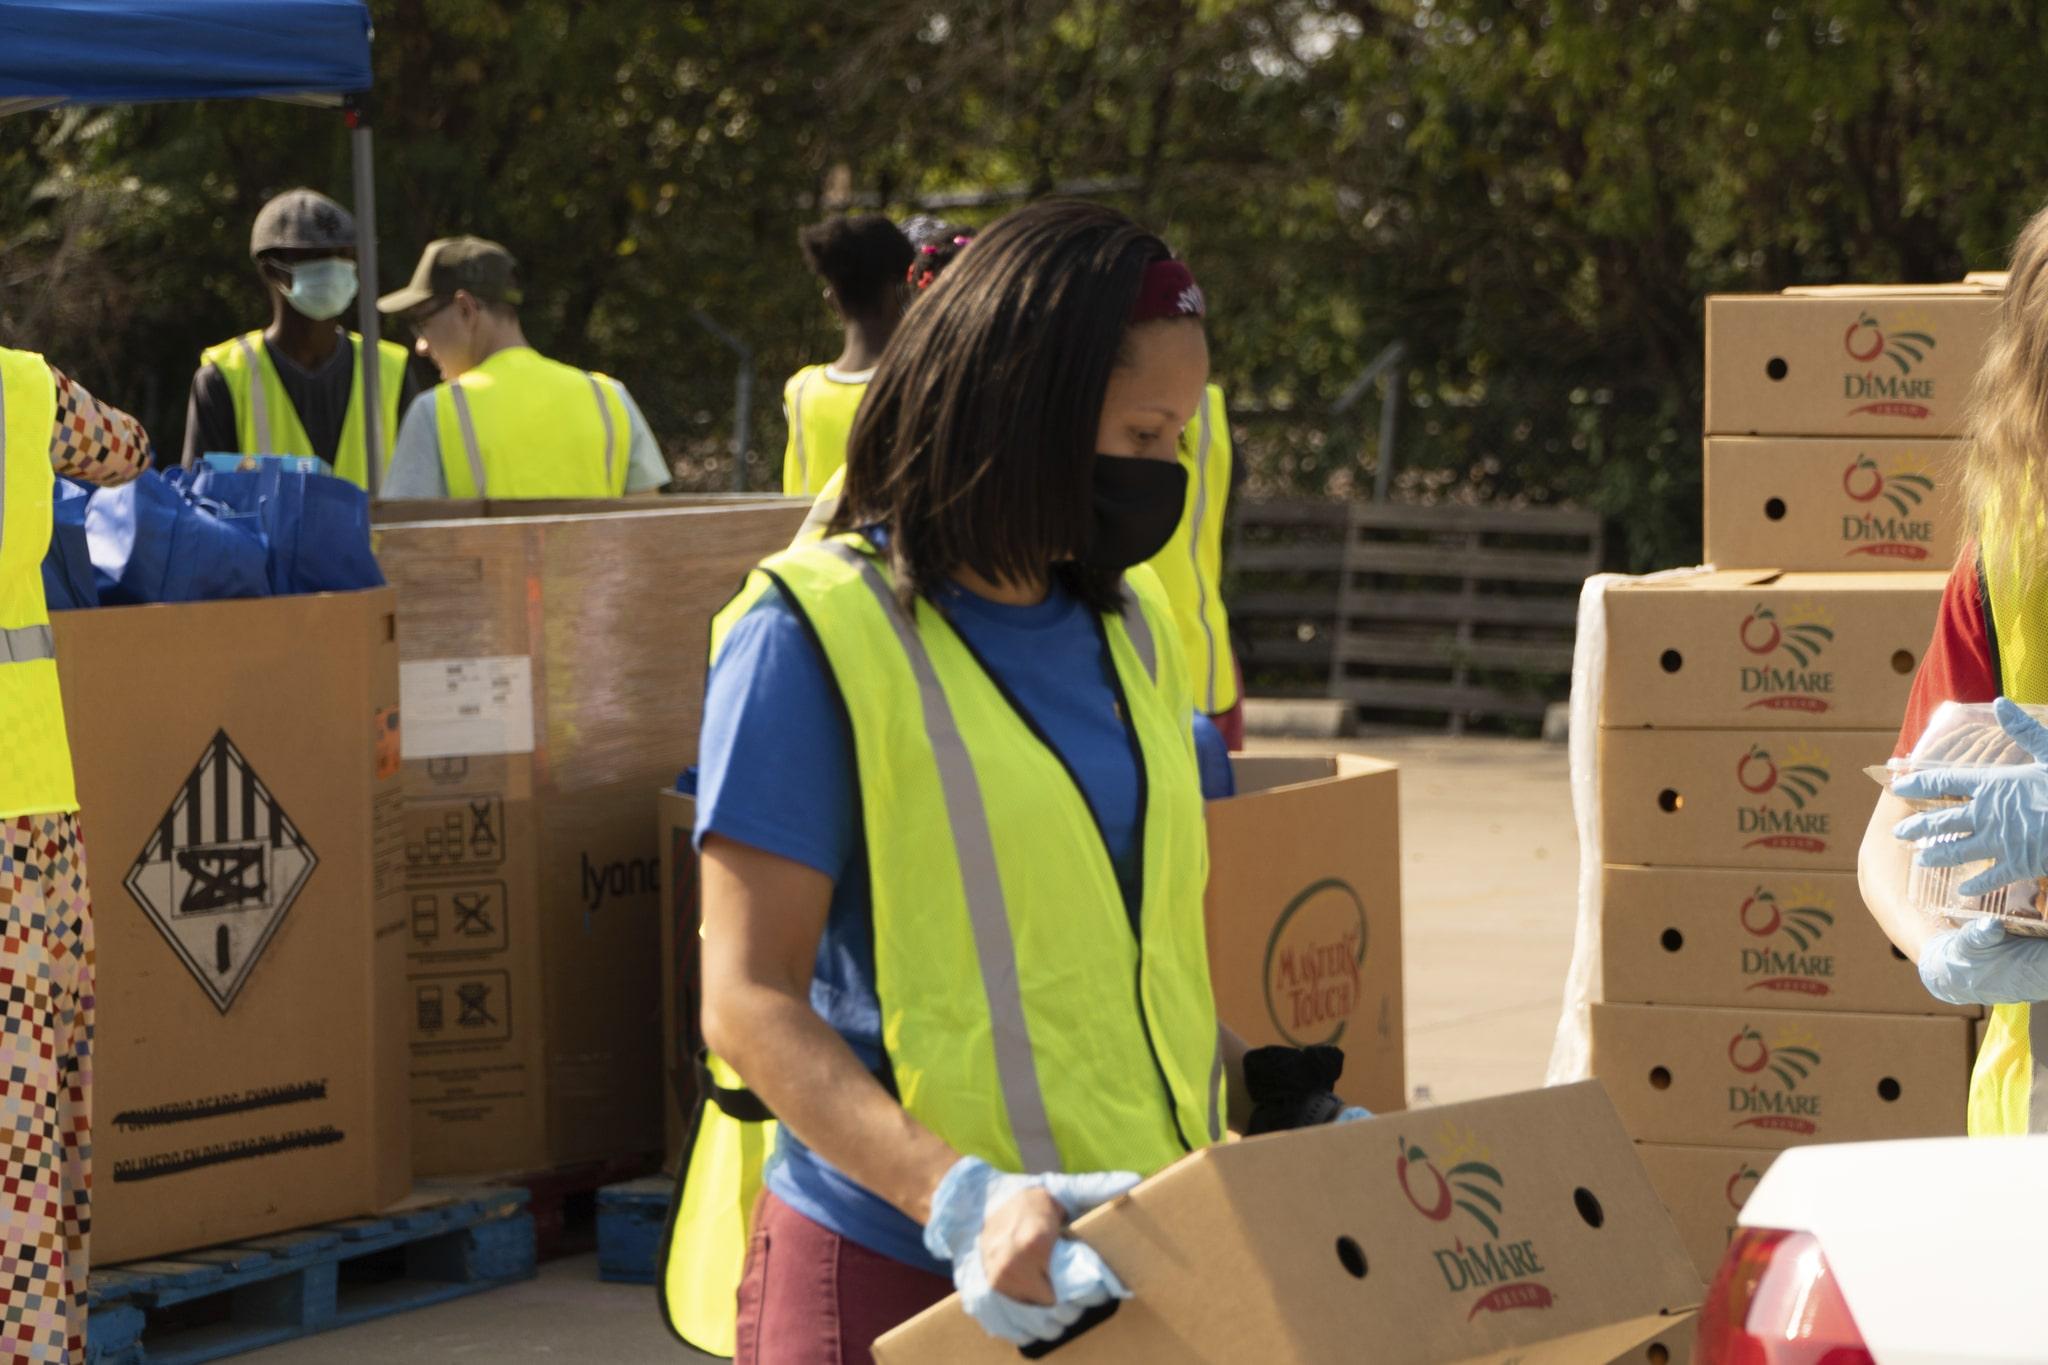 DiMare Fresh Produce Box Donation